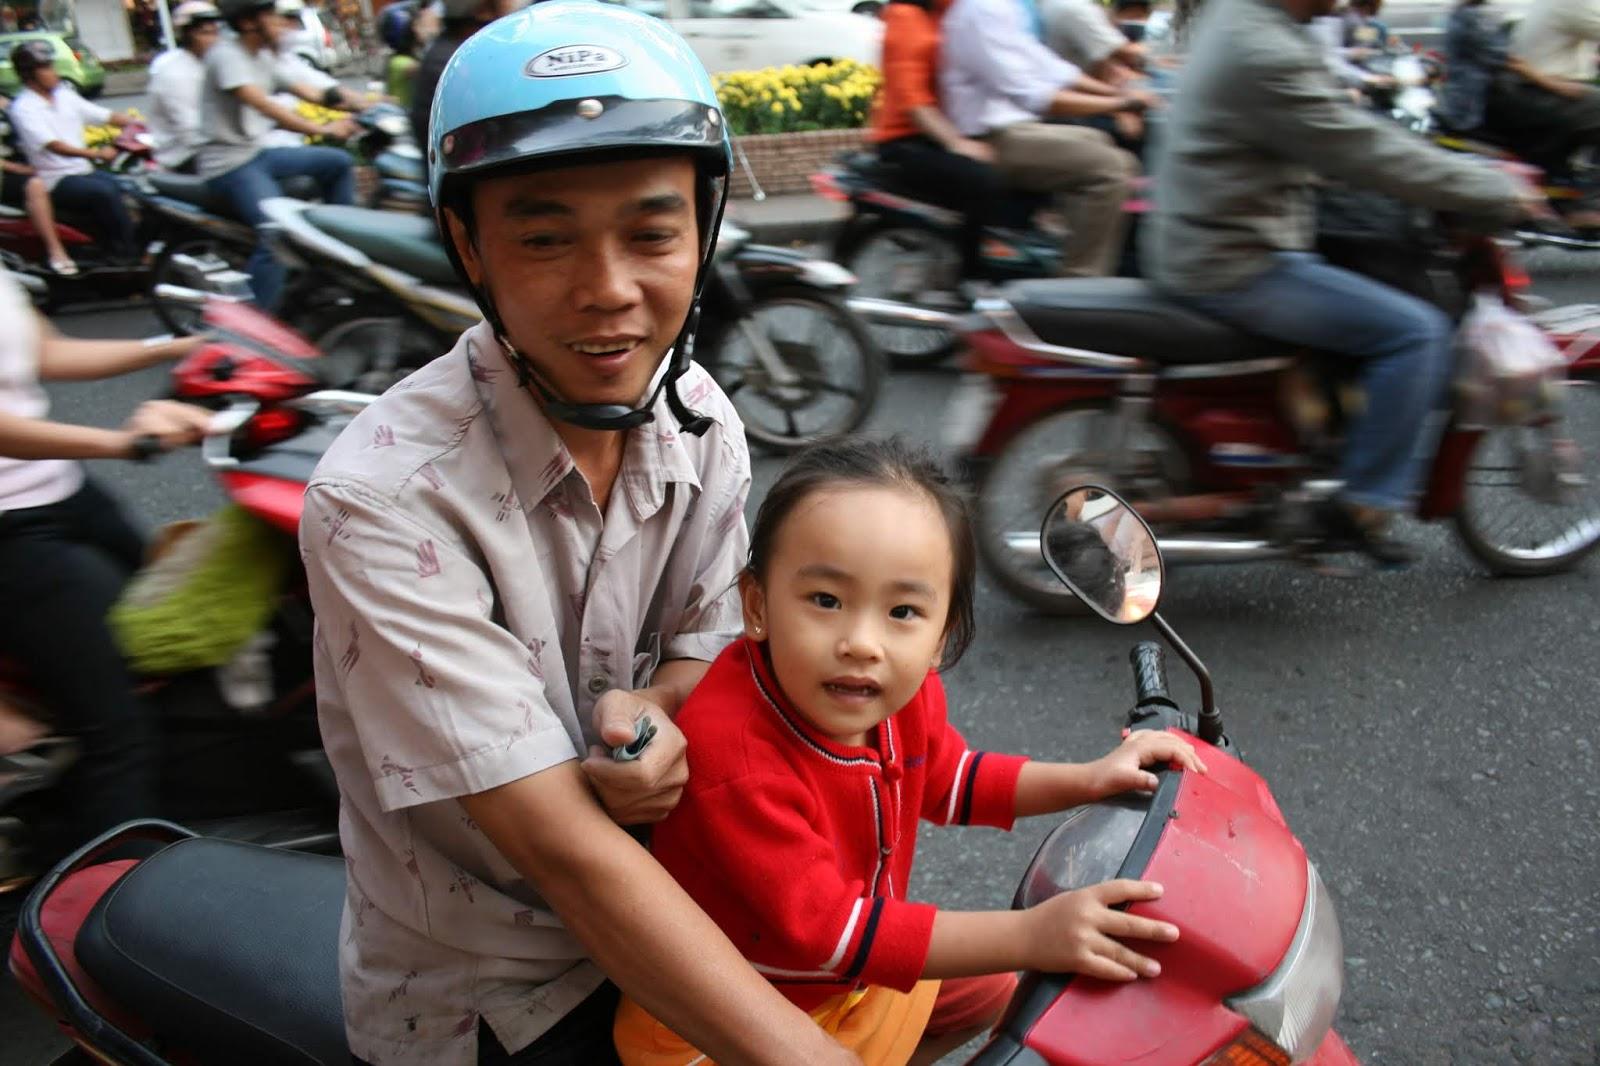 Milli Taşıma Aracı: Motosiklet Ho Chi Minh City